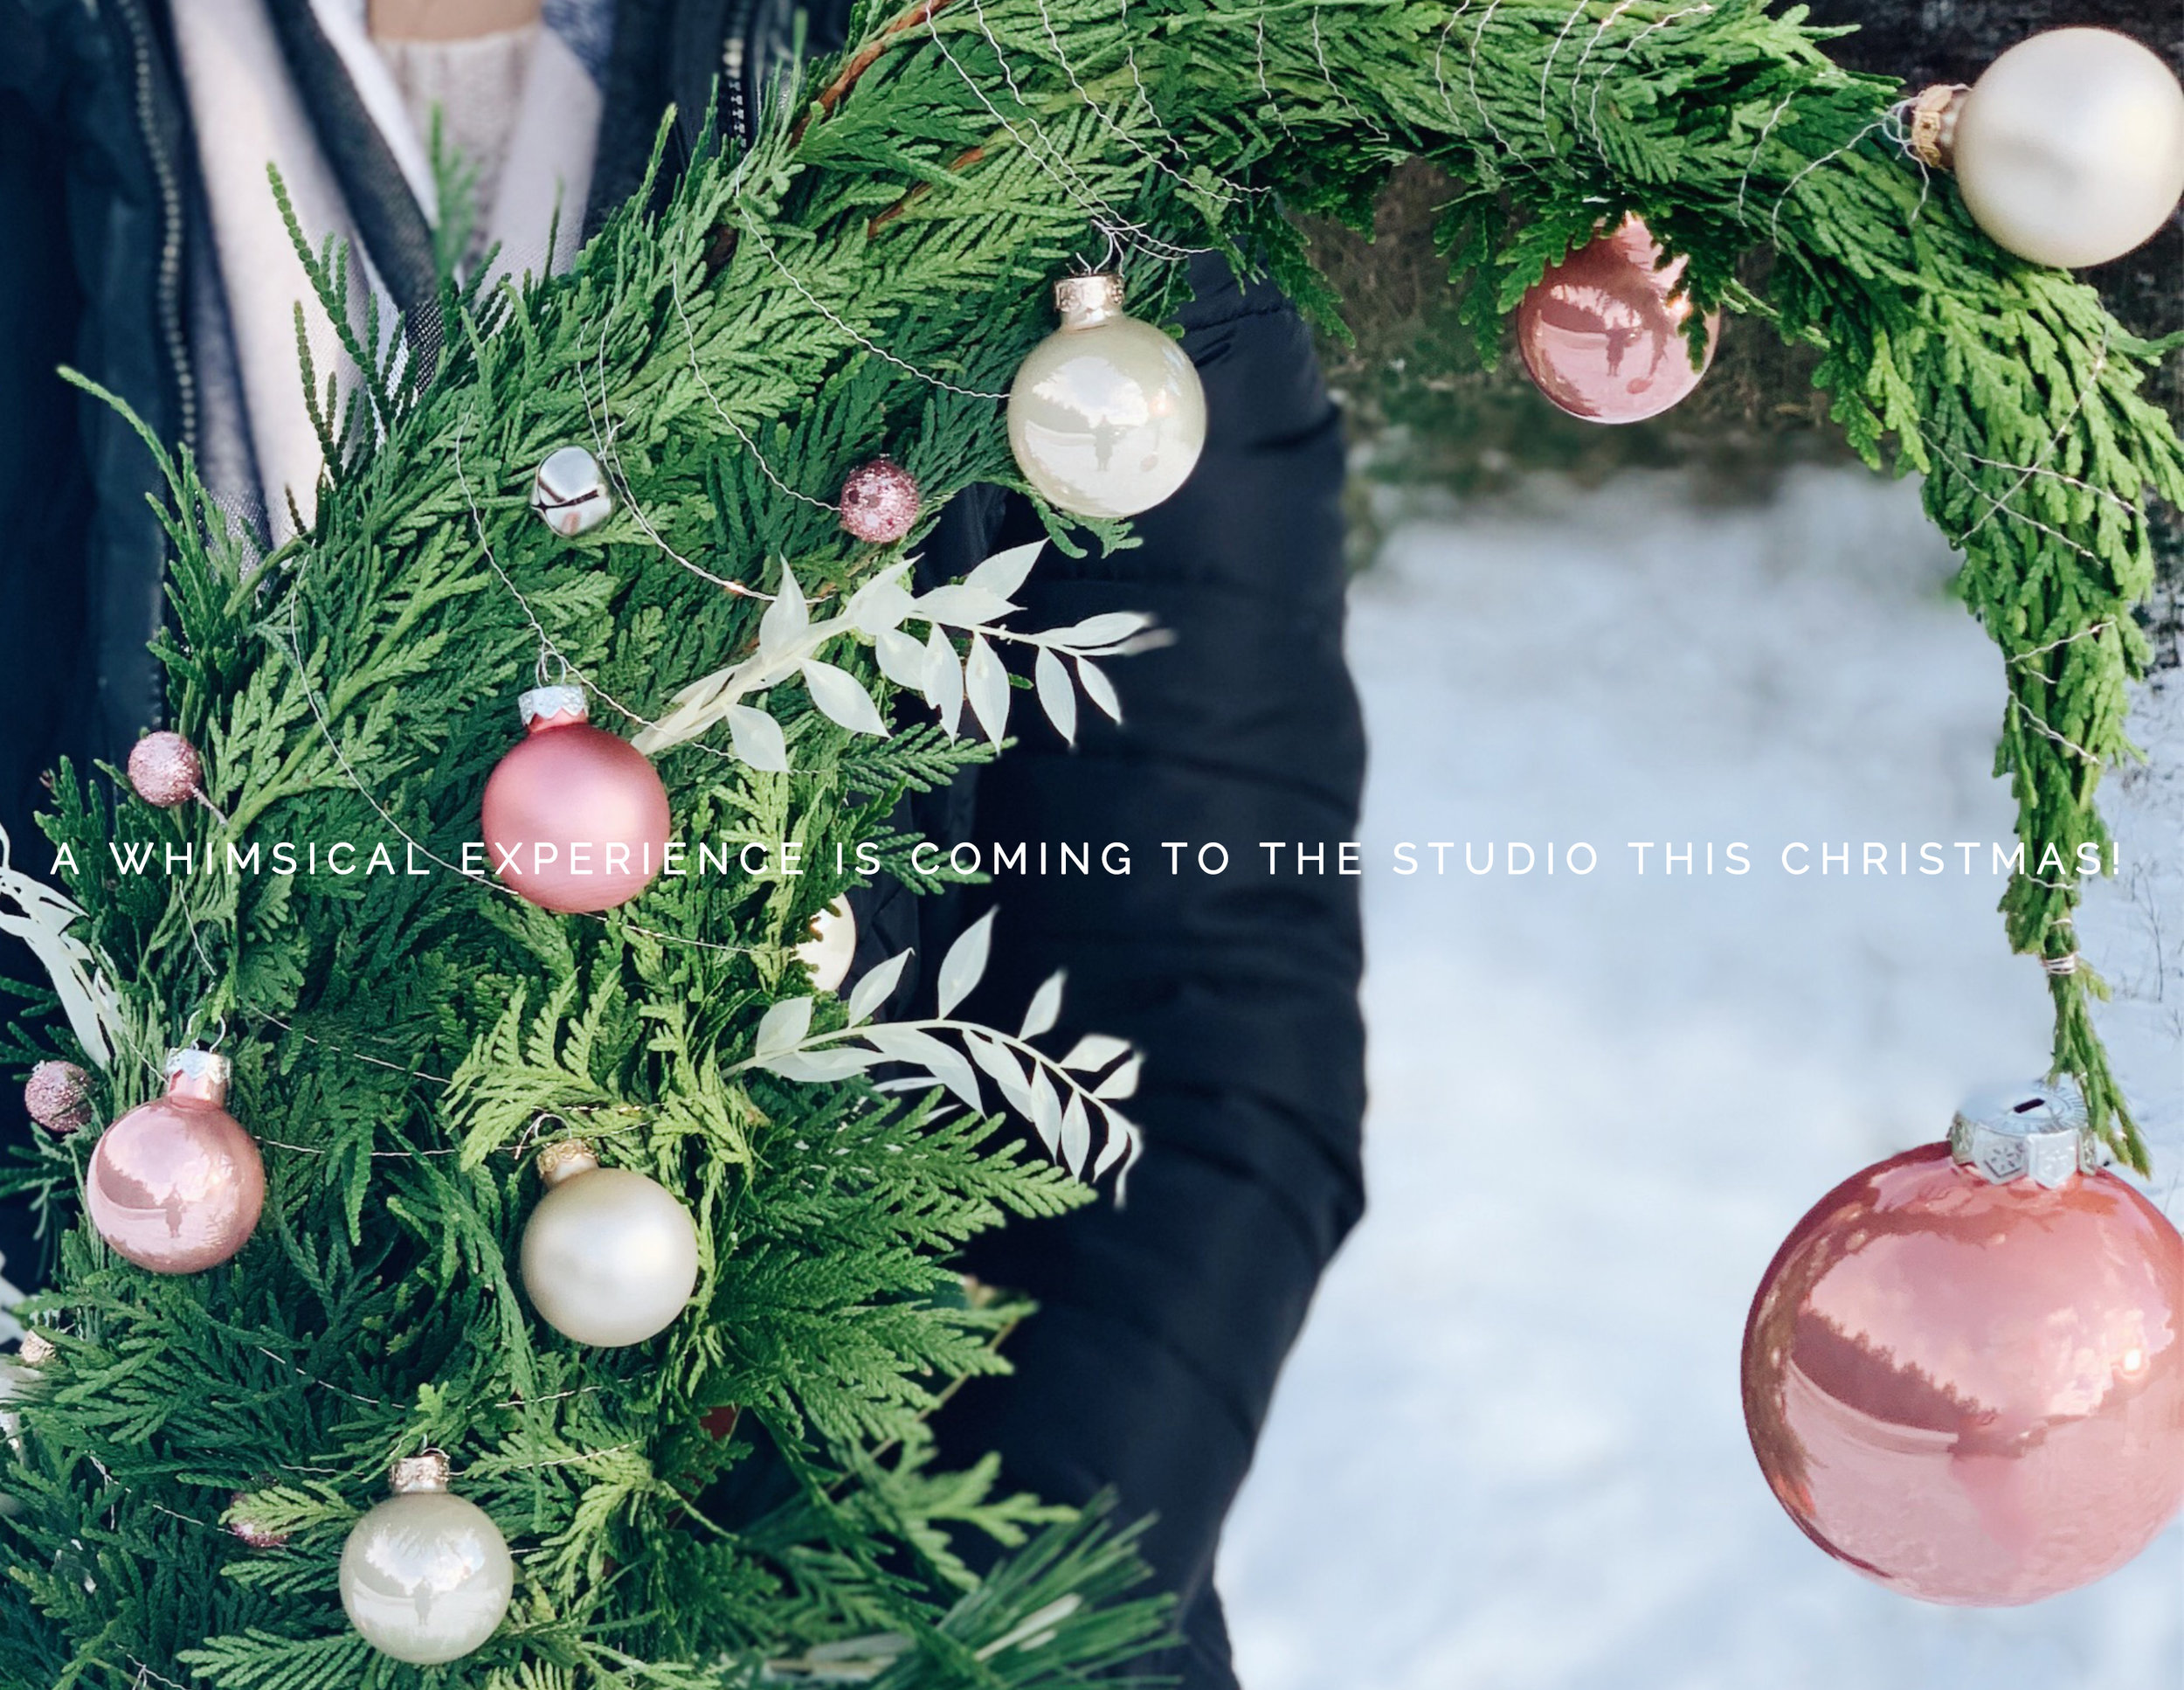 Oshawa_Bowmanville_Toronto_Christmas_Mini_Whoville_Christmas_Sessions_Petra_King_Photography